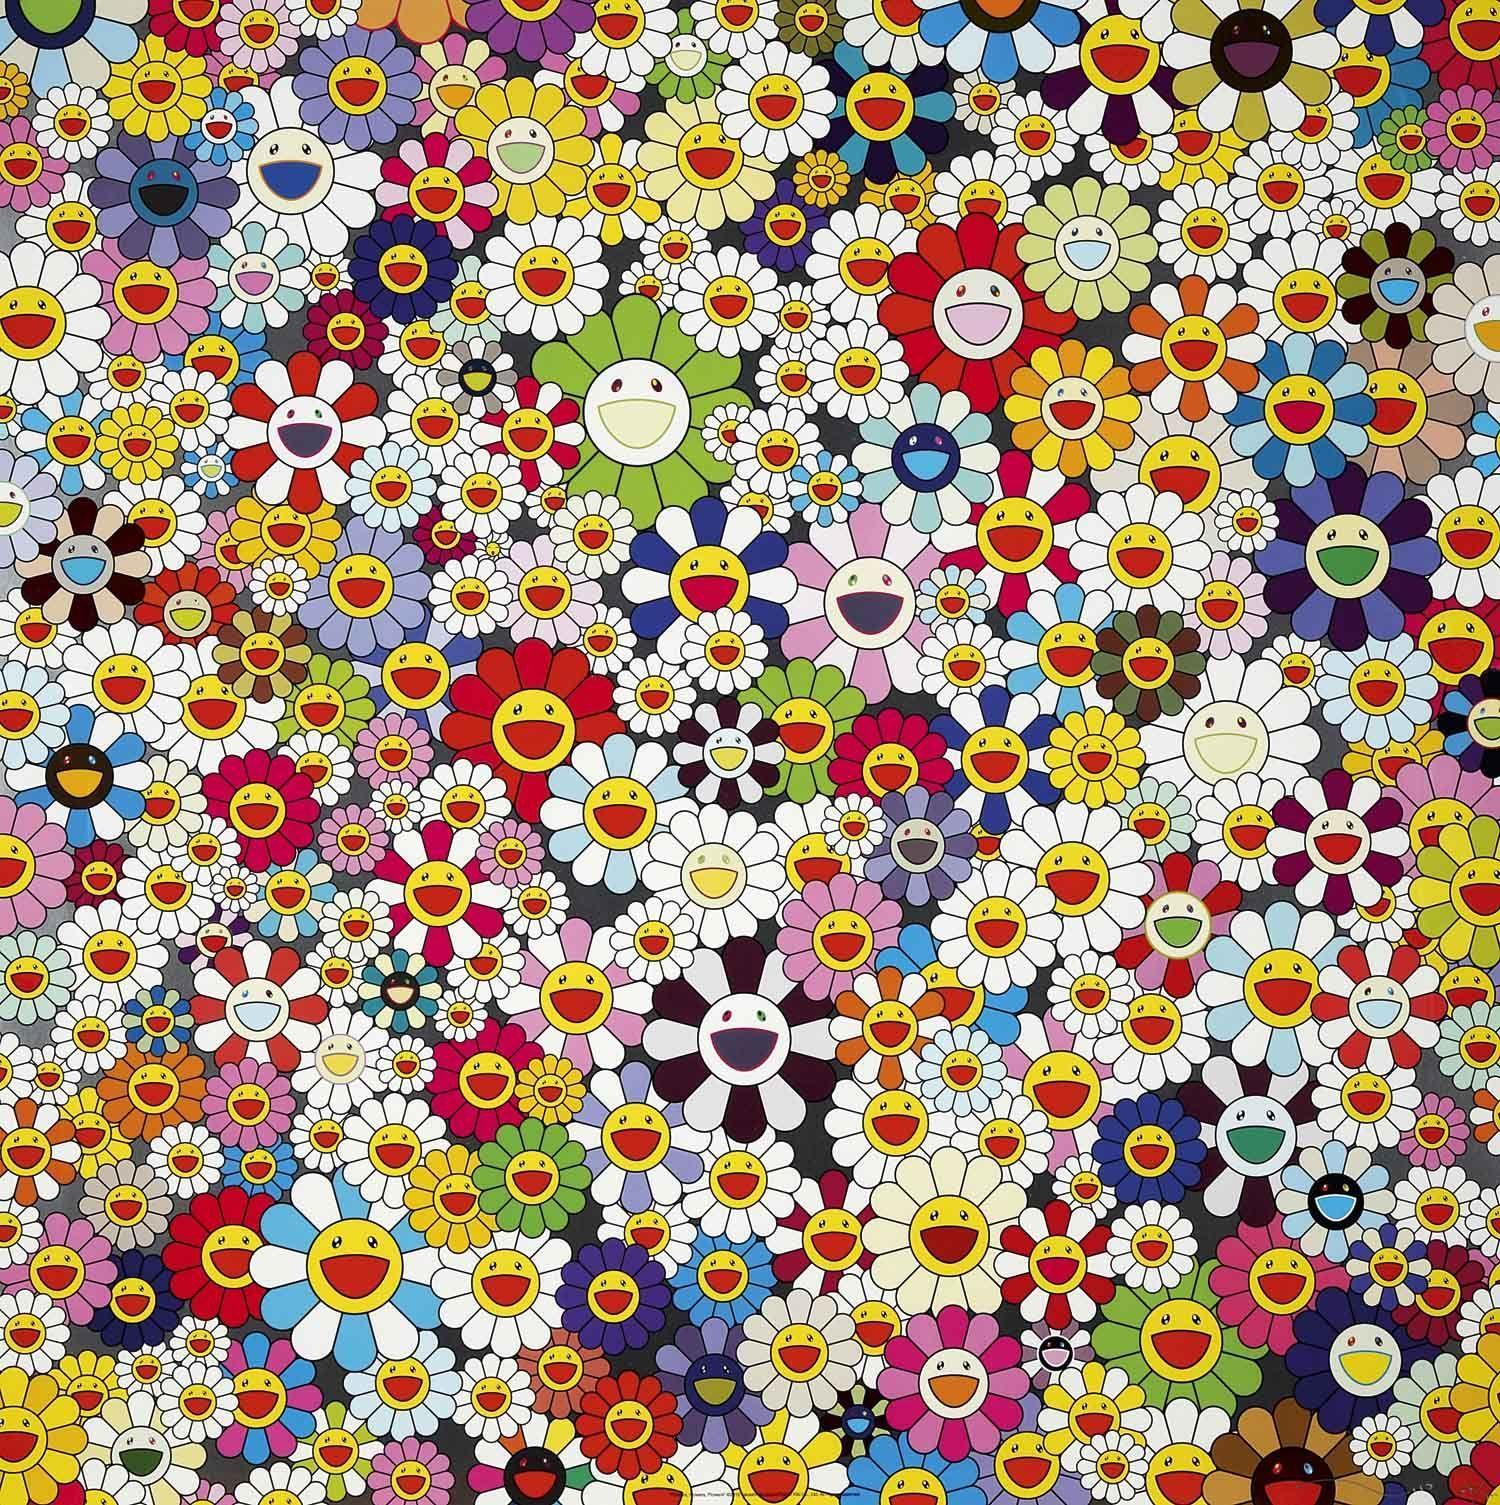 Takashi Murakami Wallpapers - Wallpaper Cave